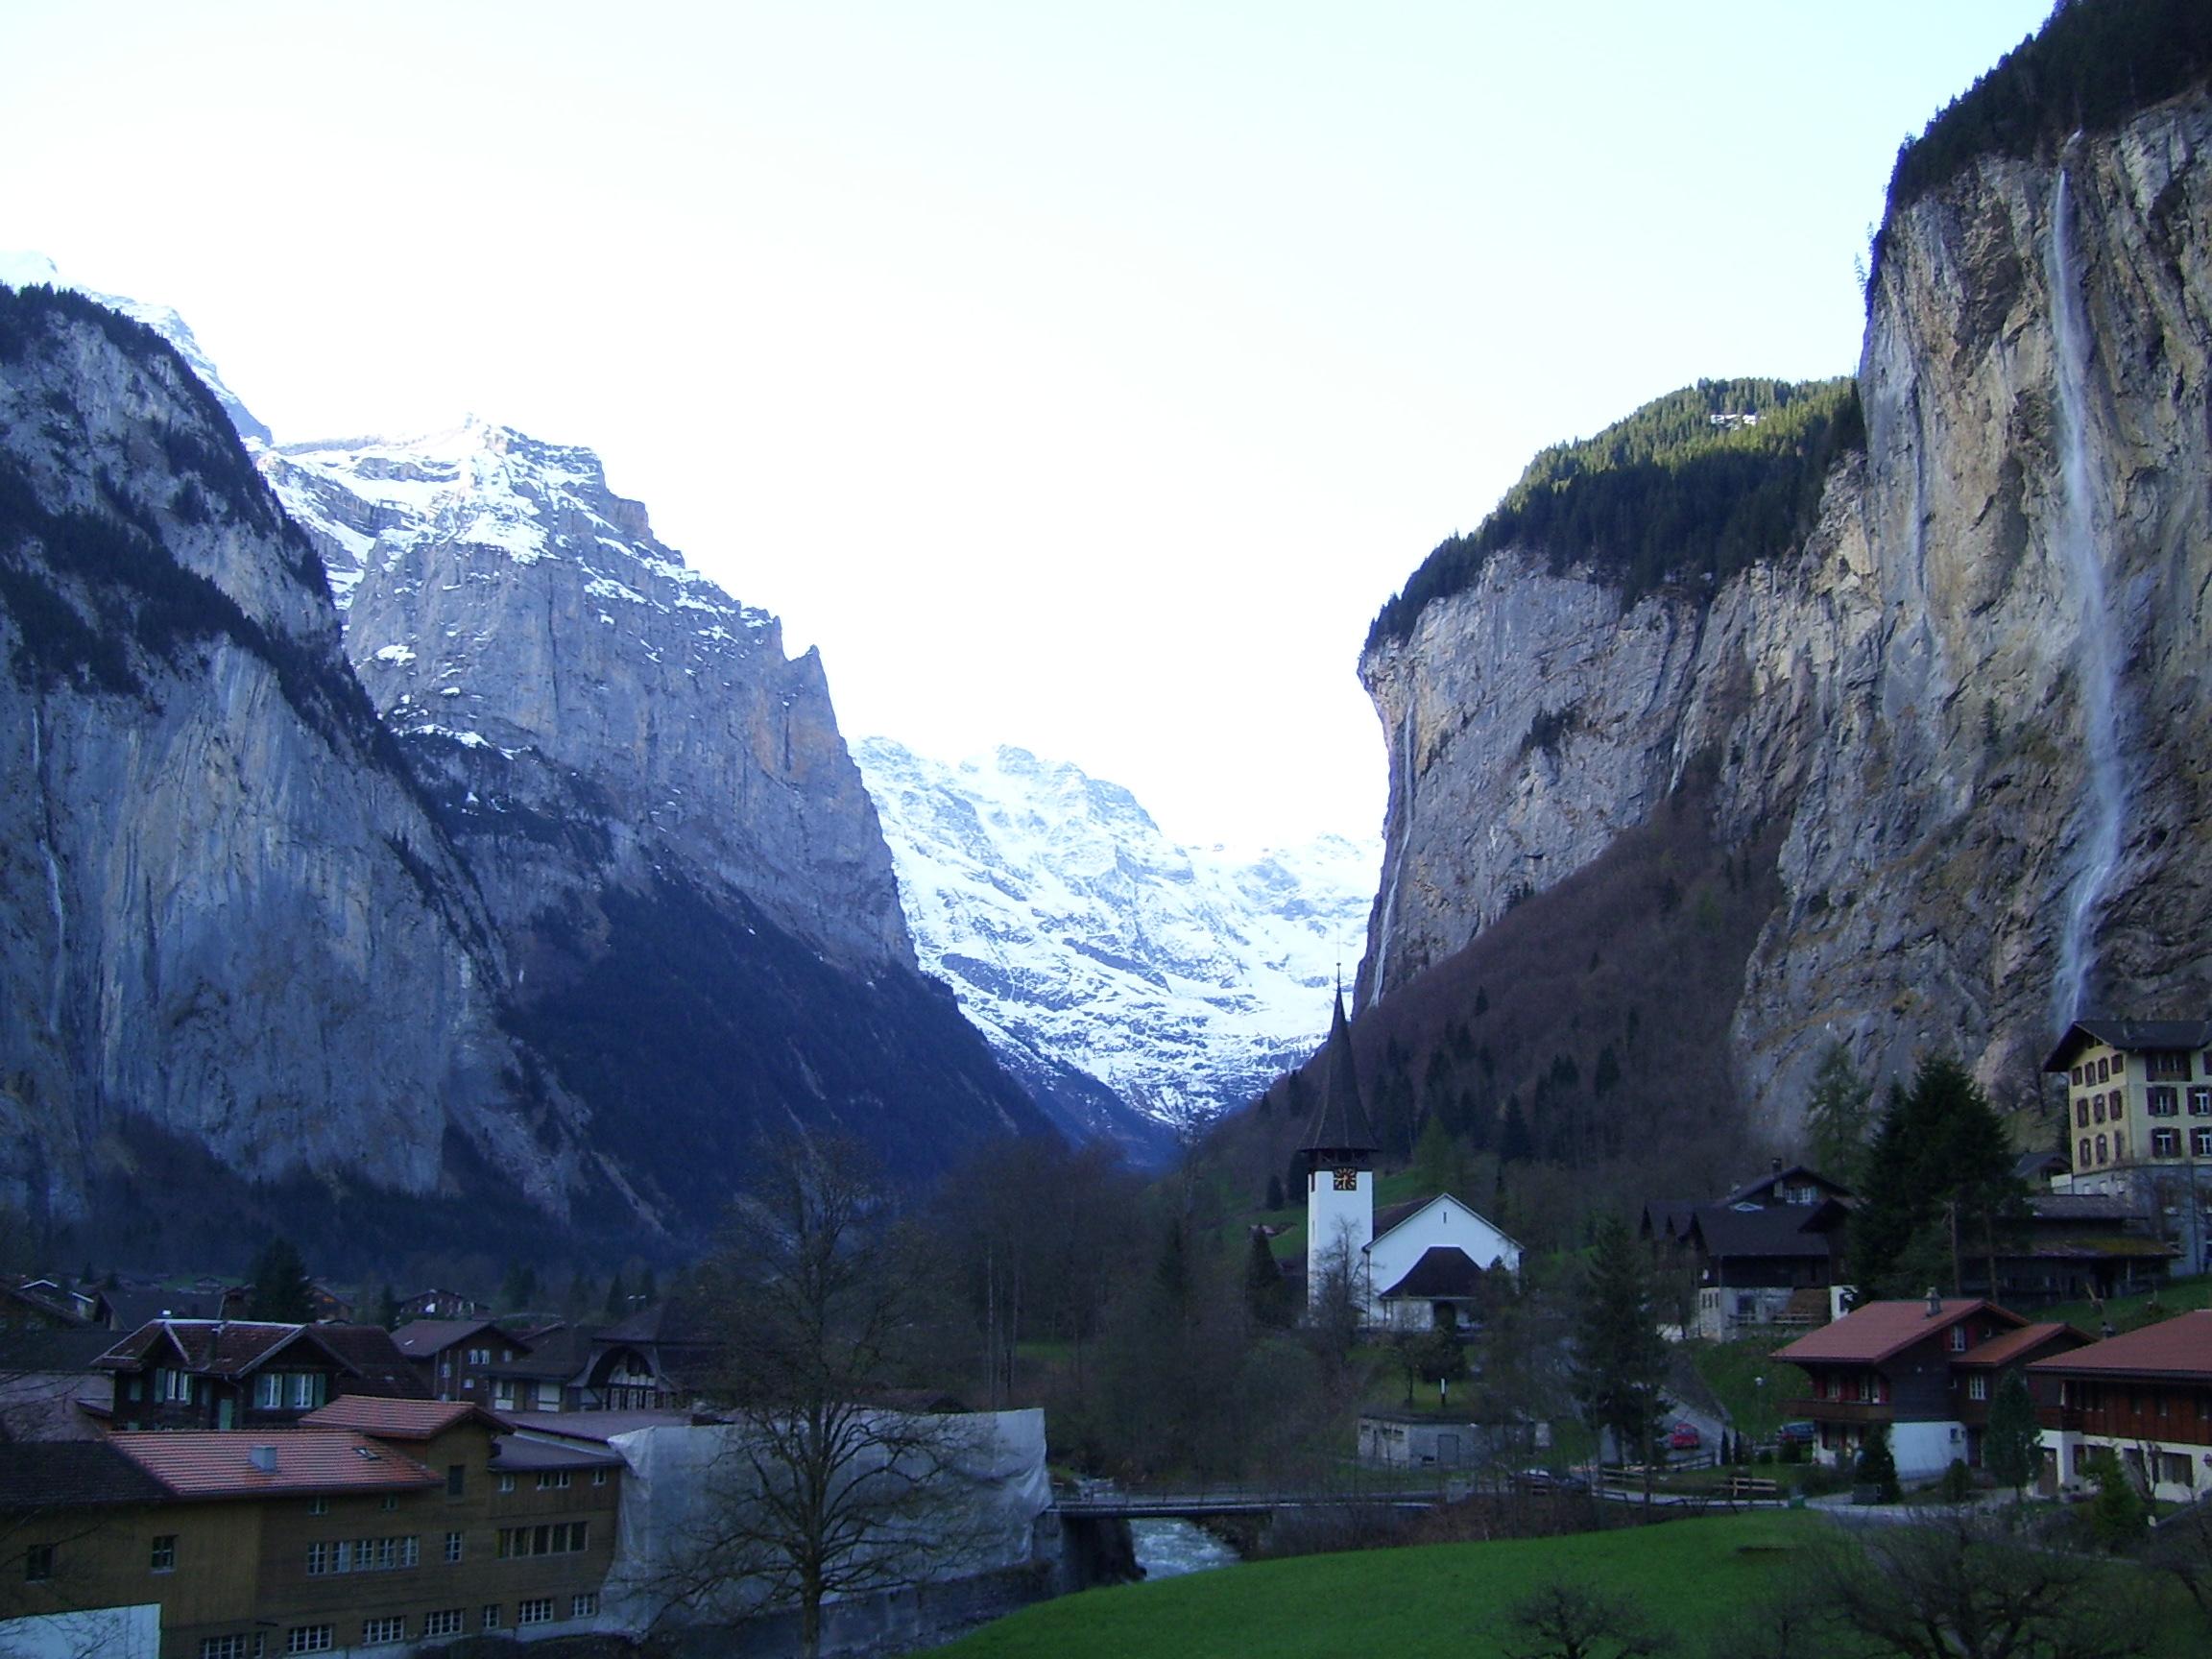 FileJungfrau Amazing Waterfall Swiss Alpsjpg